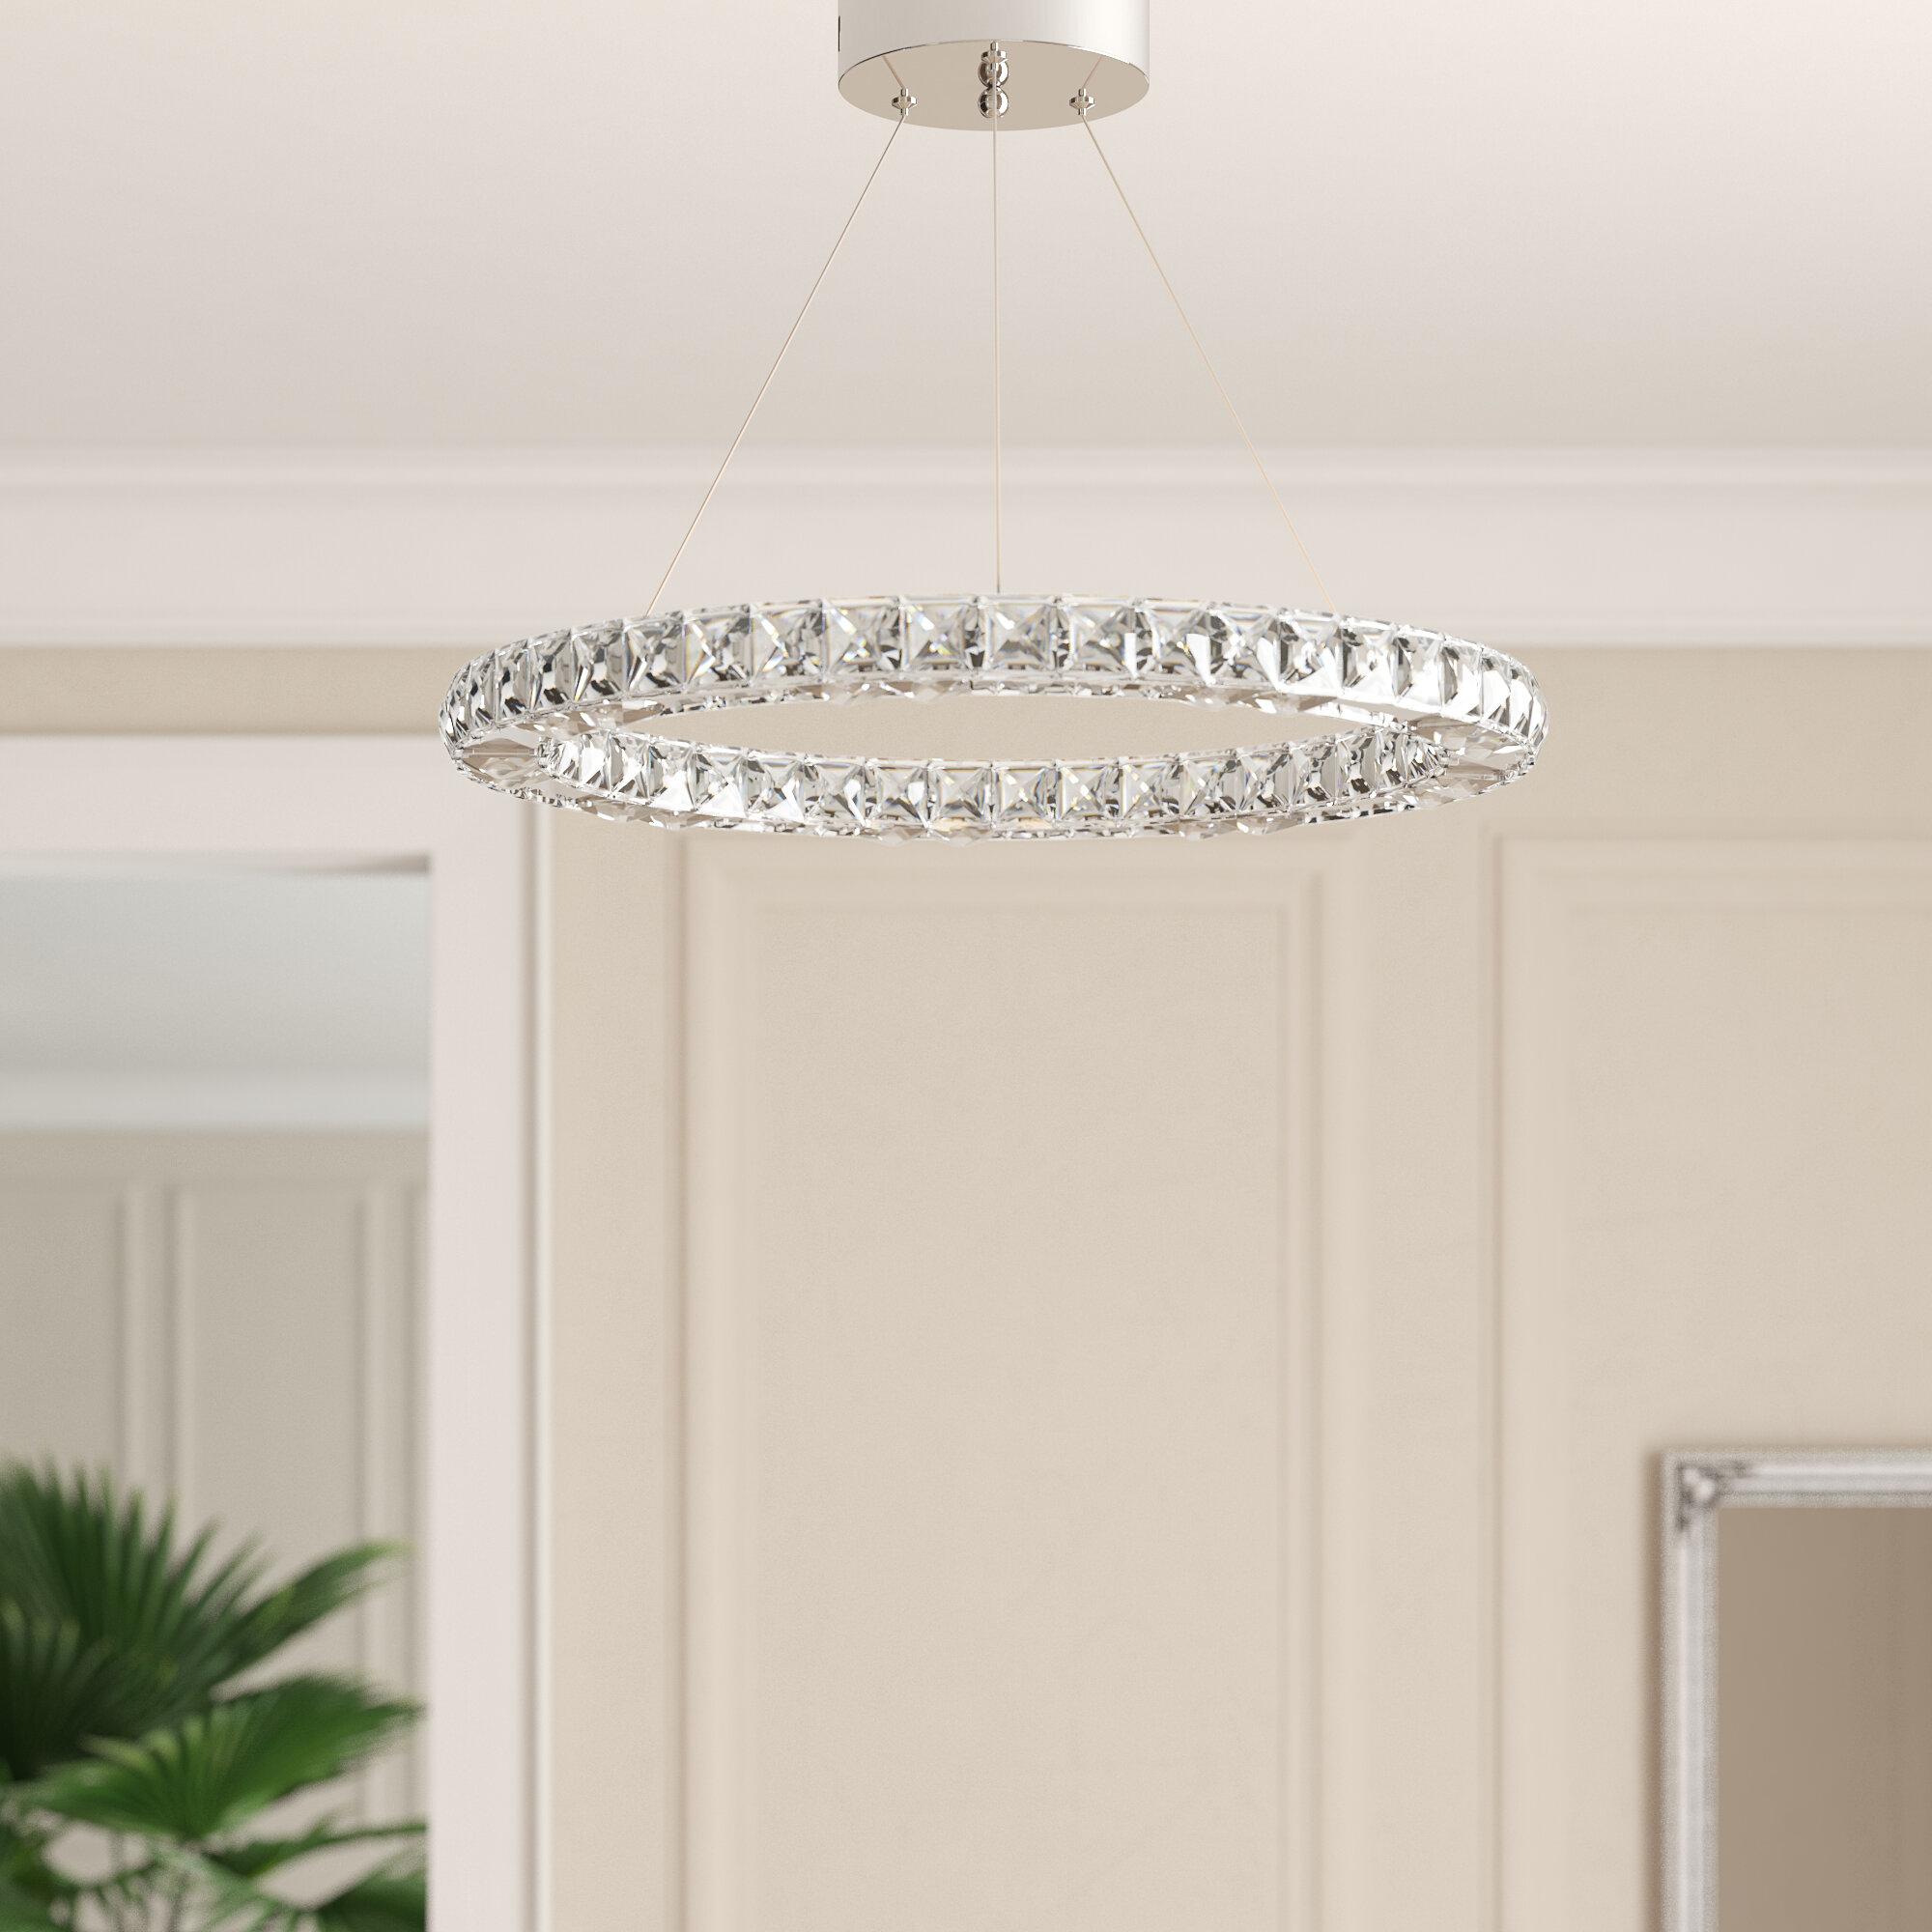 Willa Arlo Interiors 1 Light Led Crystal Pendant Reviews Wayfair Co Uk